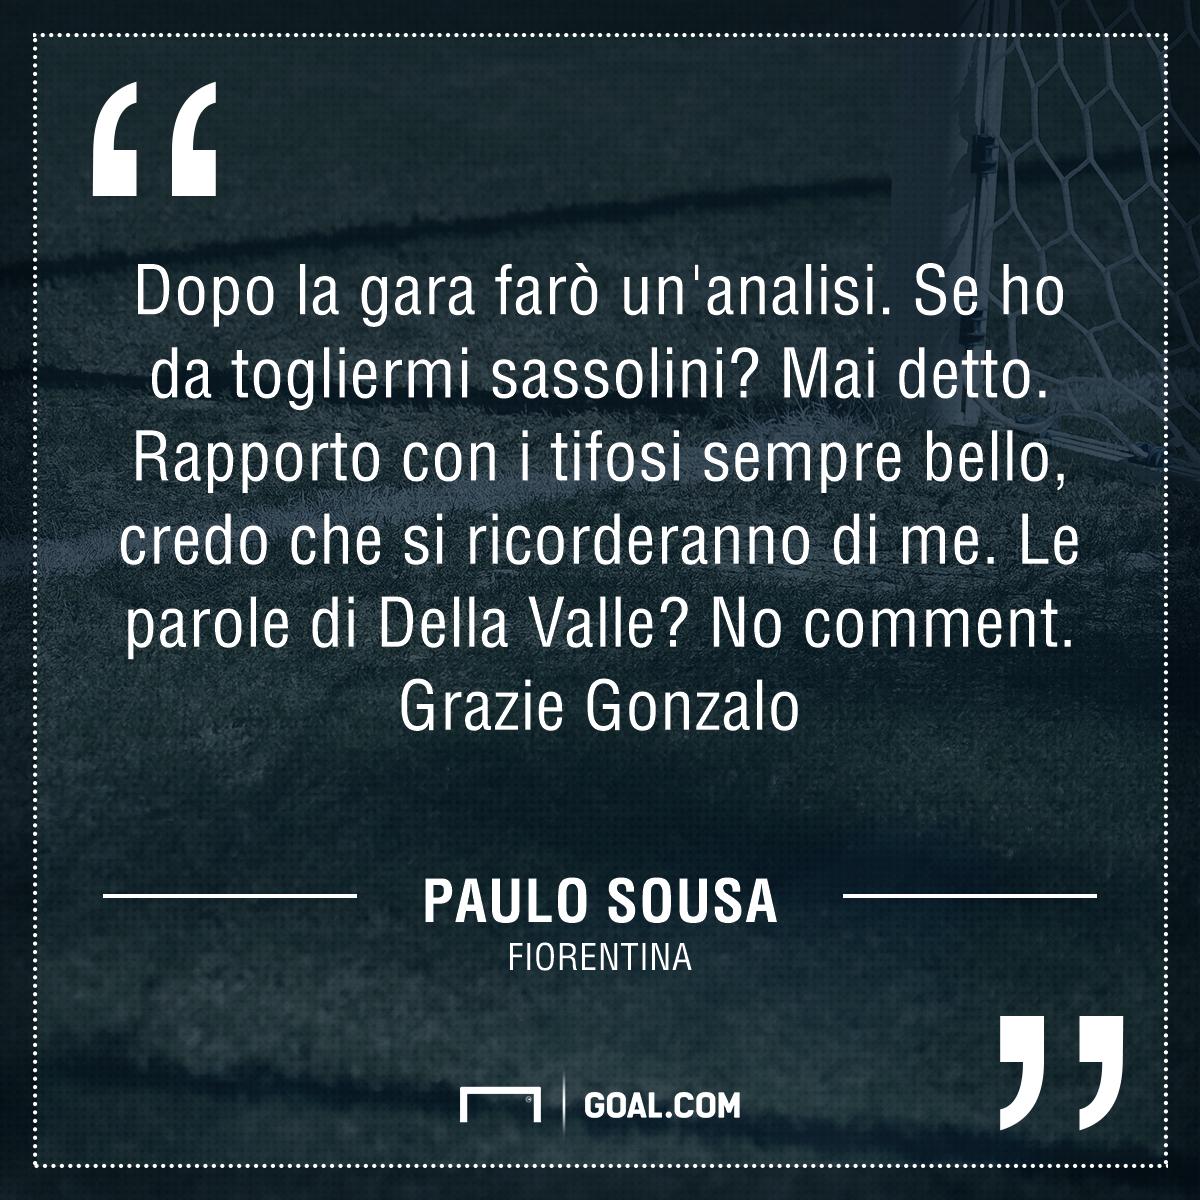 Sousa ai saluti: Firenze si ricorderà di me